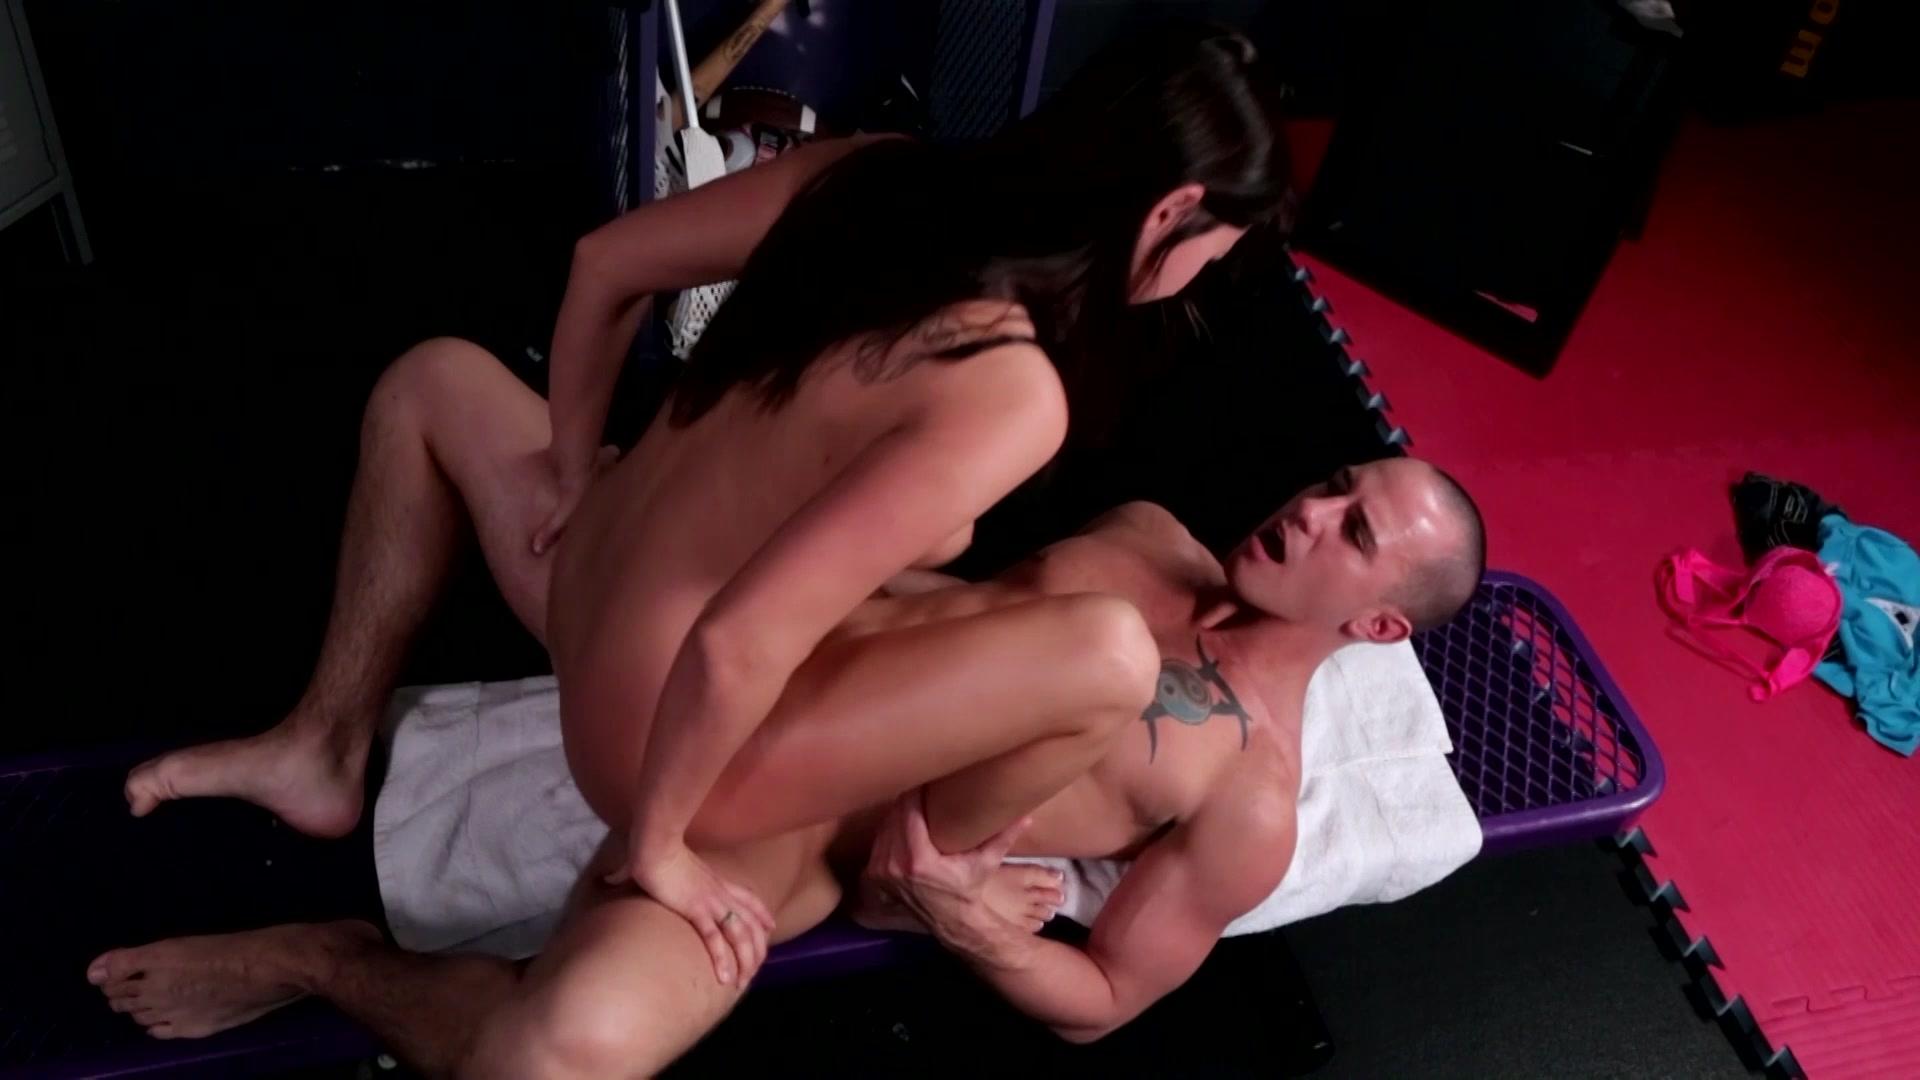 Chessis morgan anal